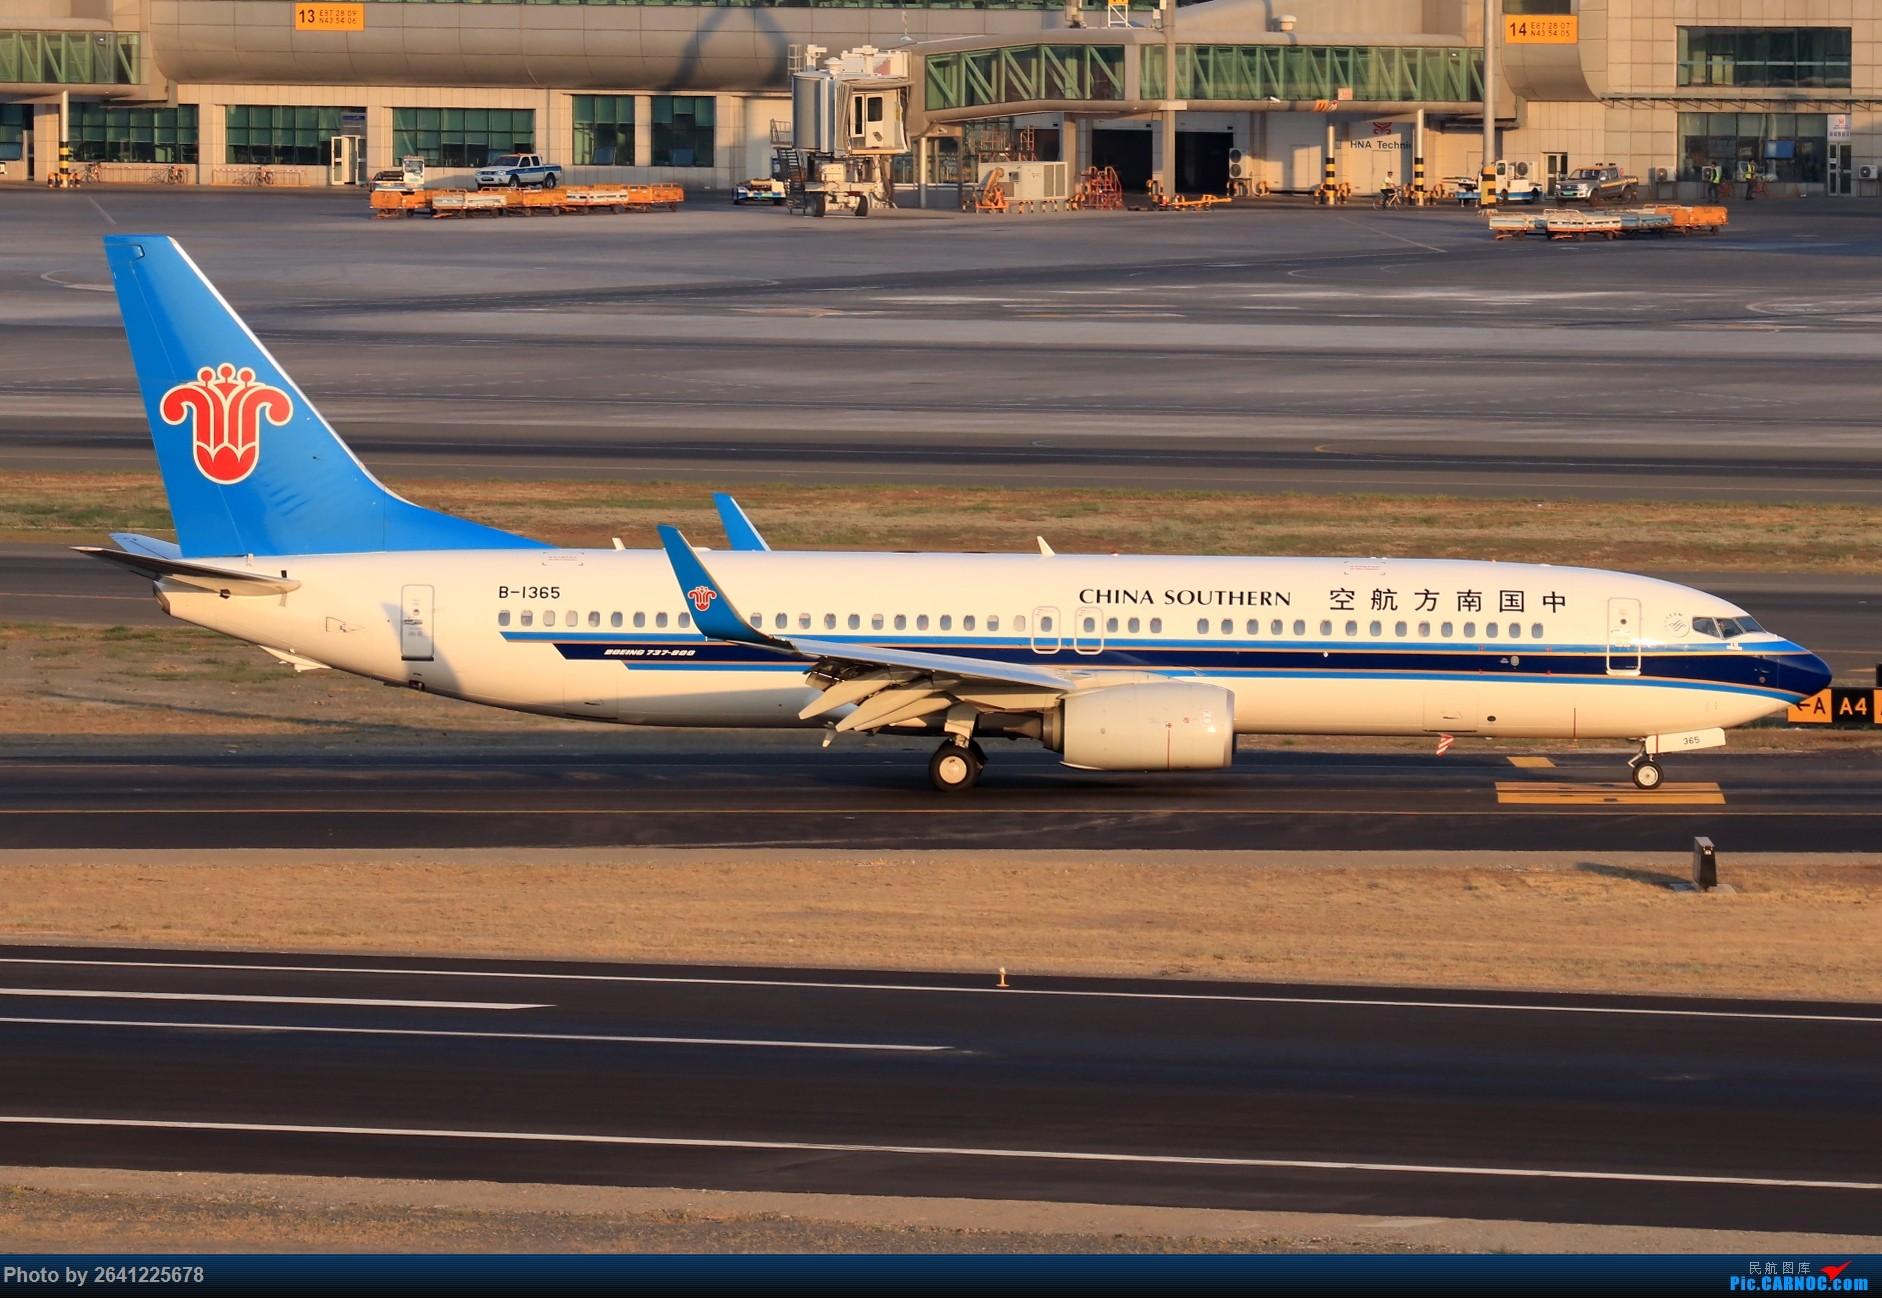 Re:[原创]【小周游记第7集拍机贴】乌鲁木齐绝美的地景和光线 BOEING 737-800 B-1365 中国乌鲁木齐地窝堡国际机场